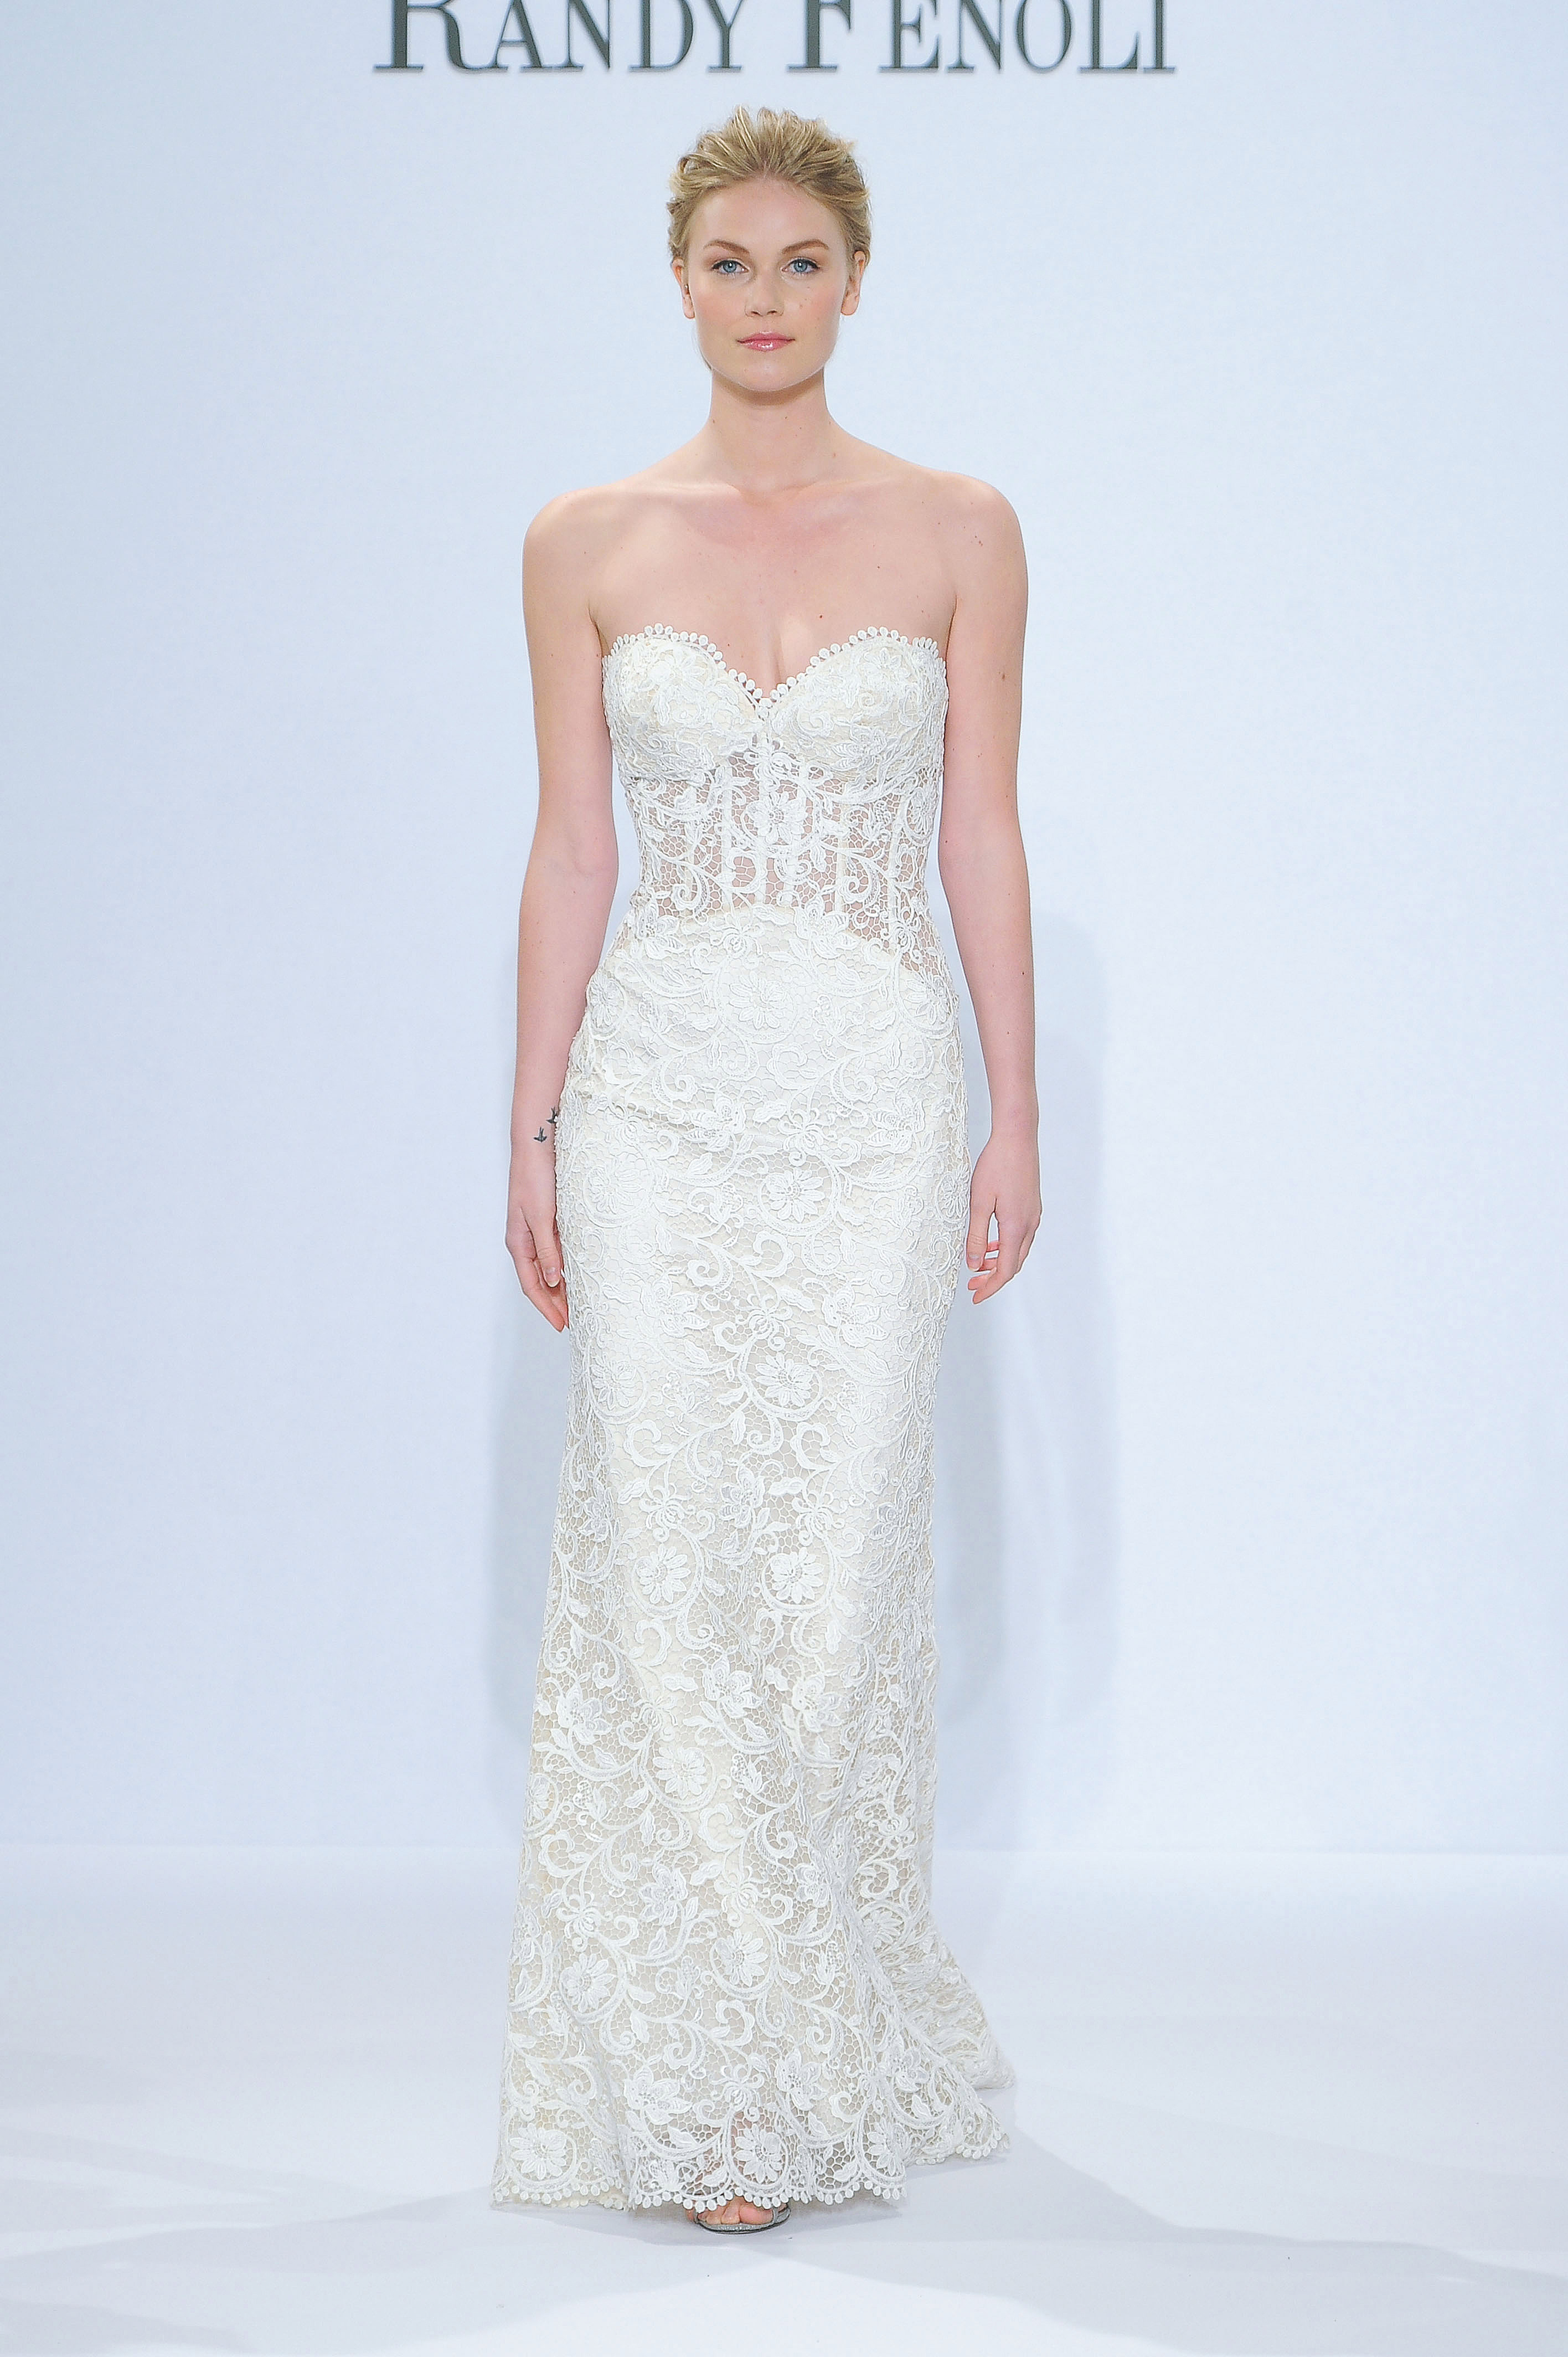 randy fenoli sweetheart wedding dress spring 2018